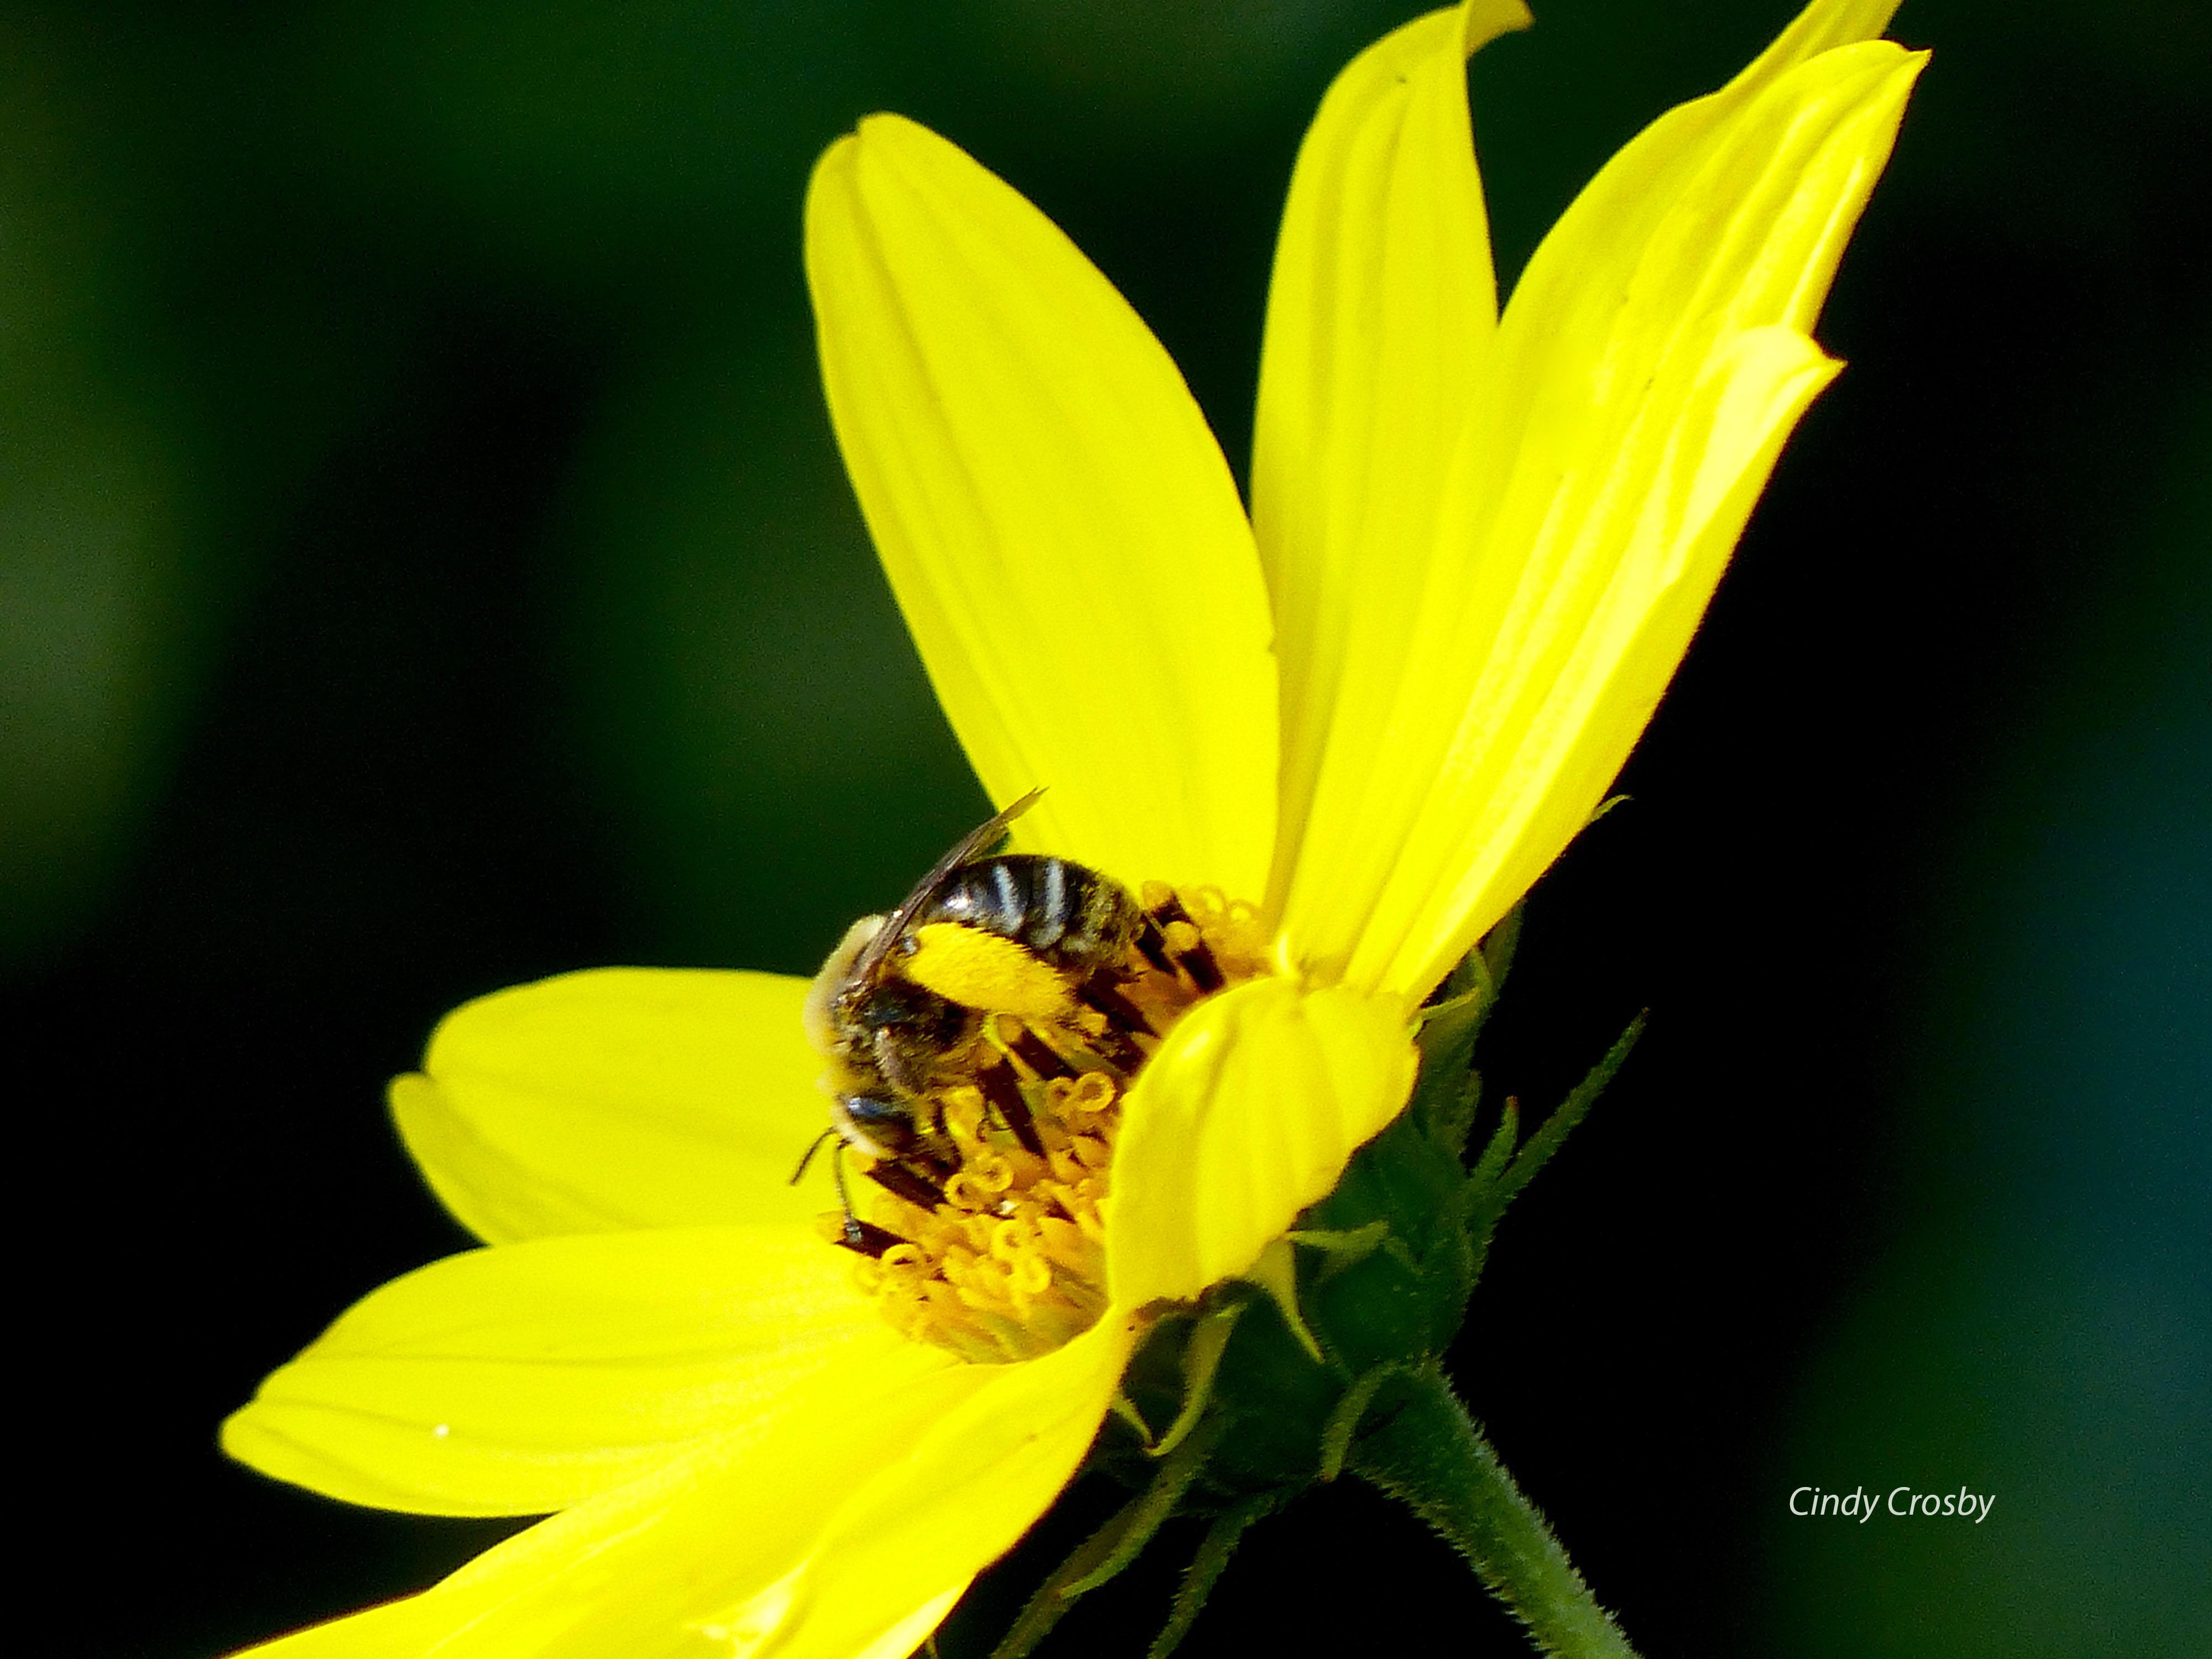 beeonwoodlandsunflowerWM73018NG.jpg